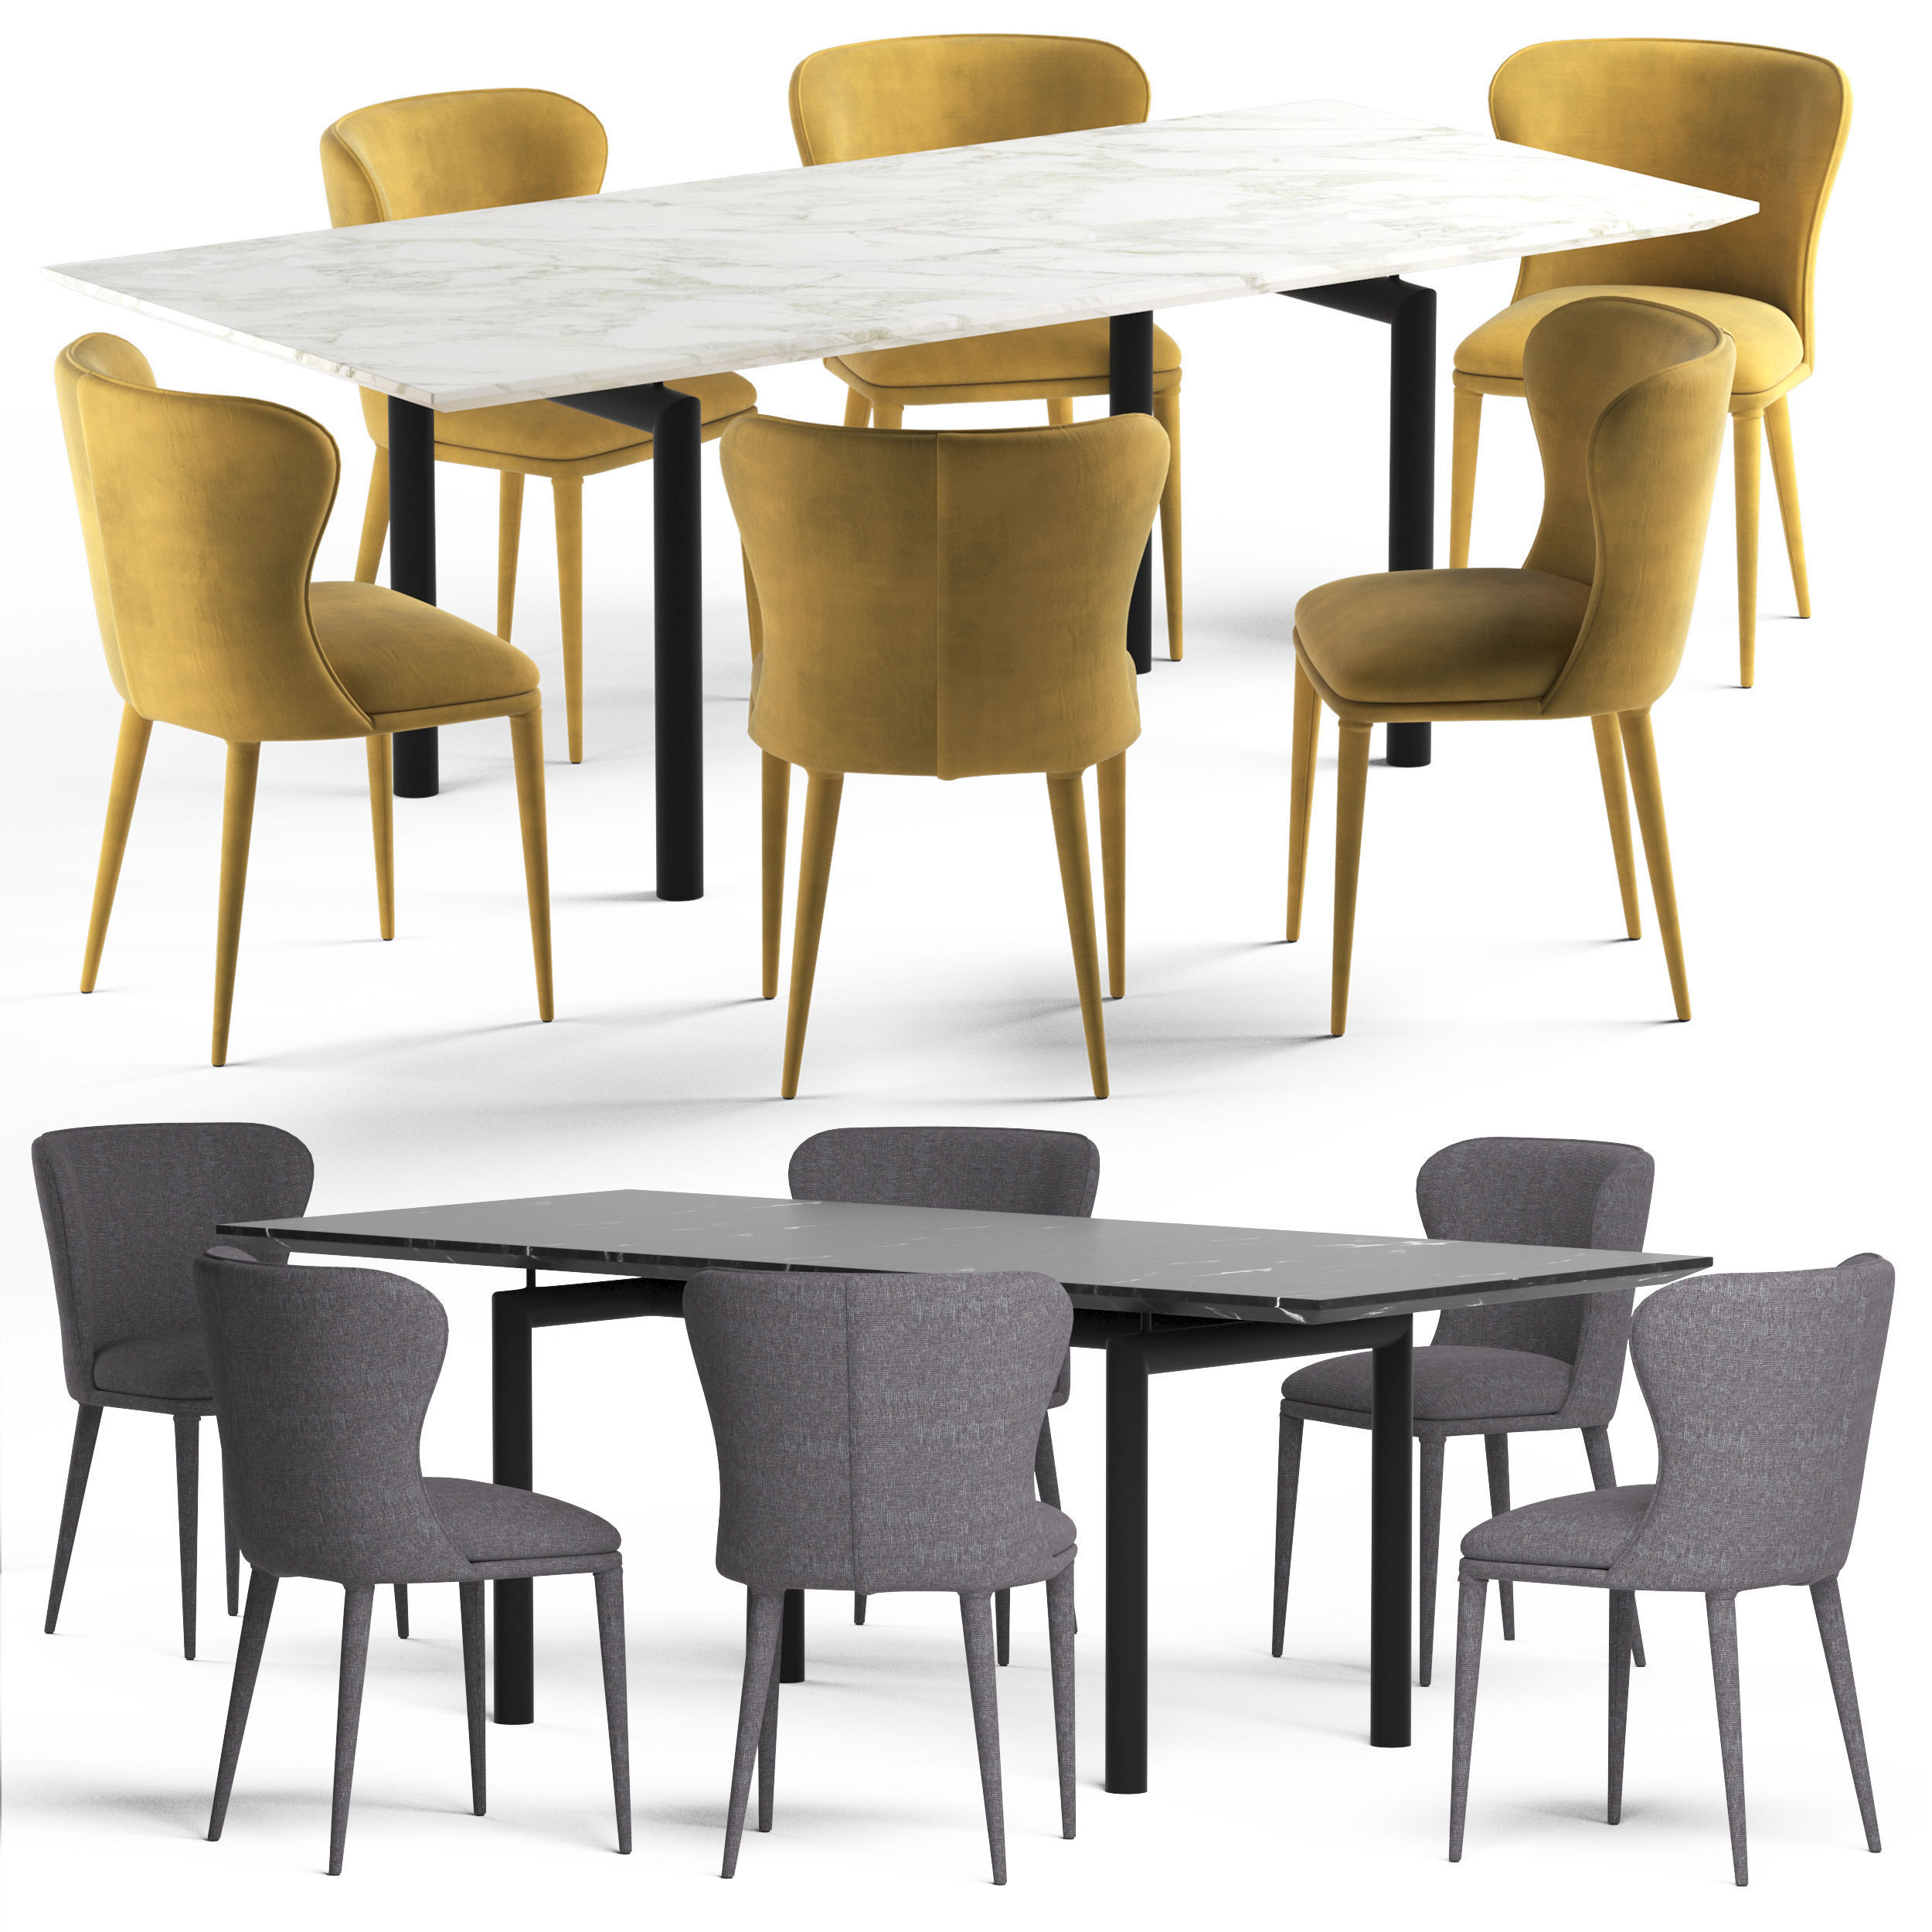 Globewest Amara Table and Eloise Chair